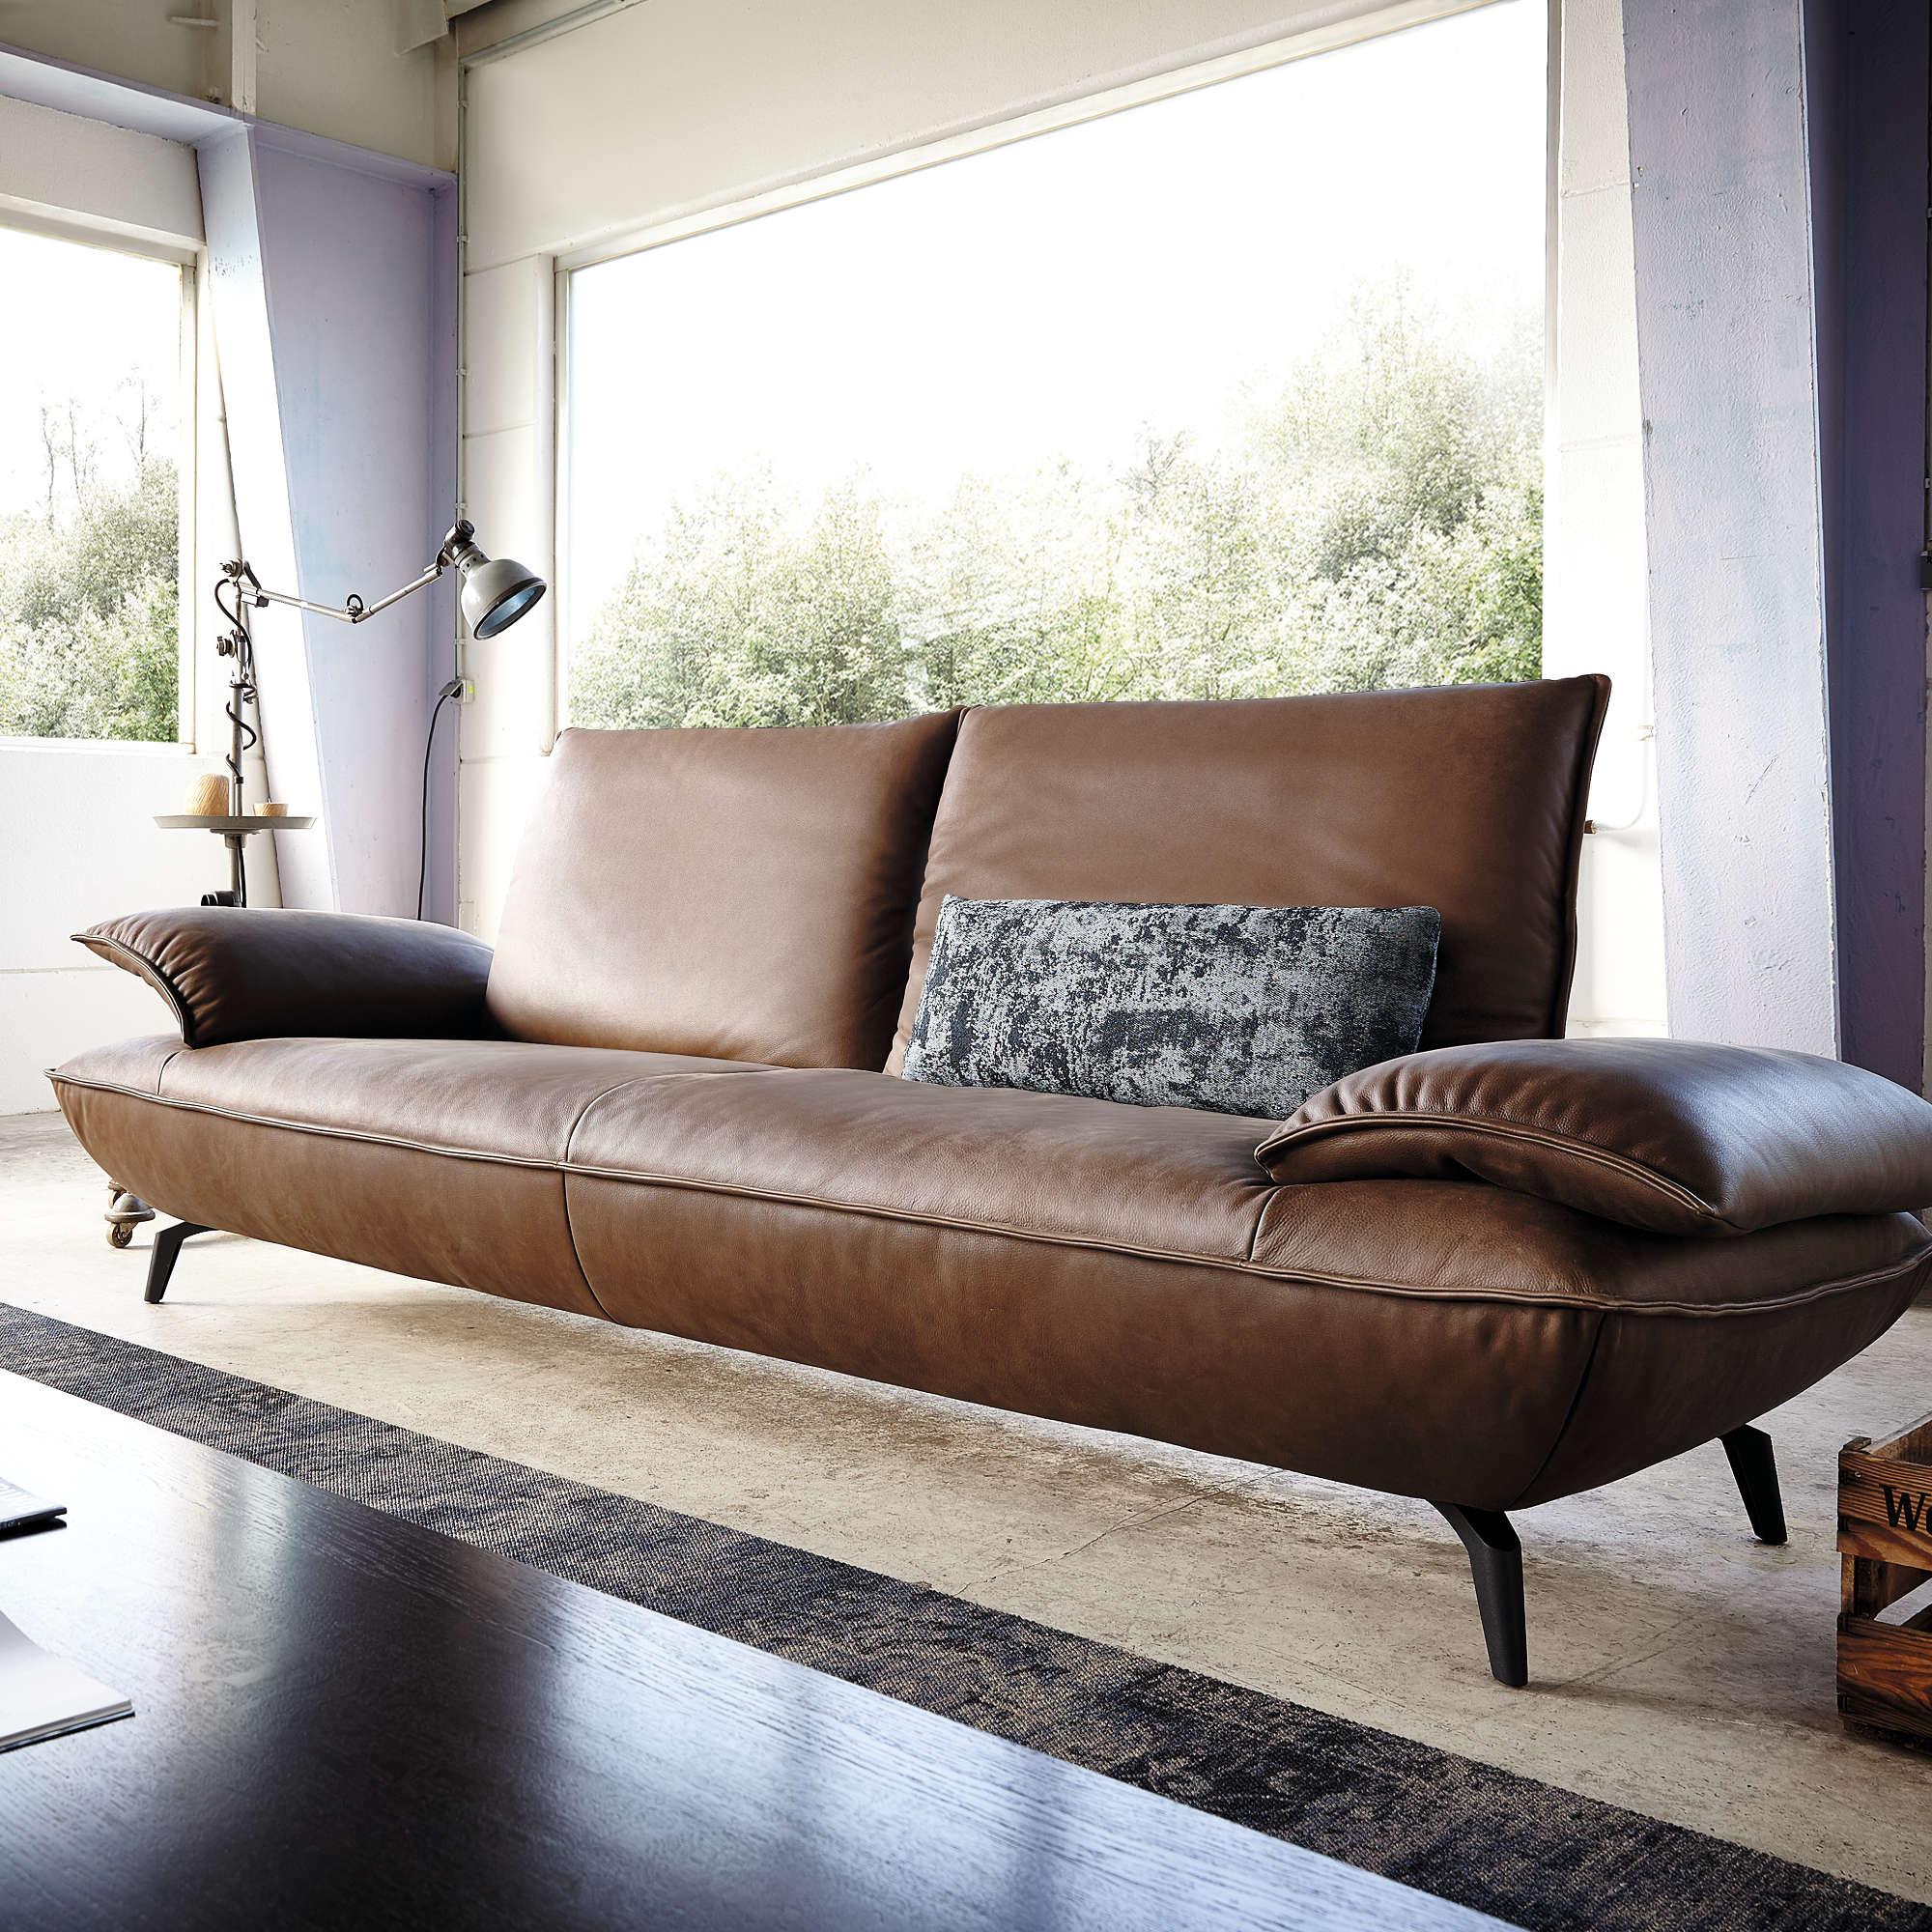 Top Designer Sofas 53 For Your with Designer Sofas